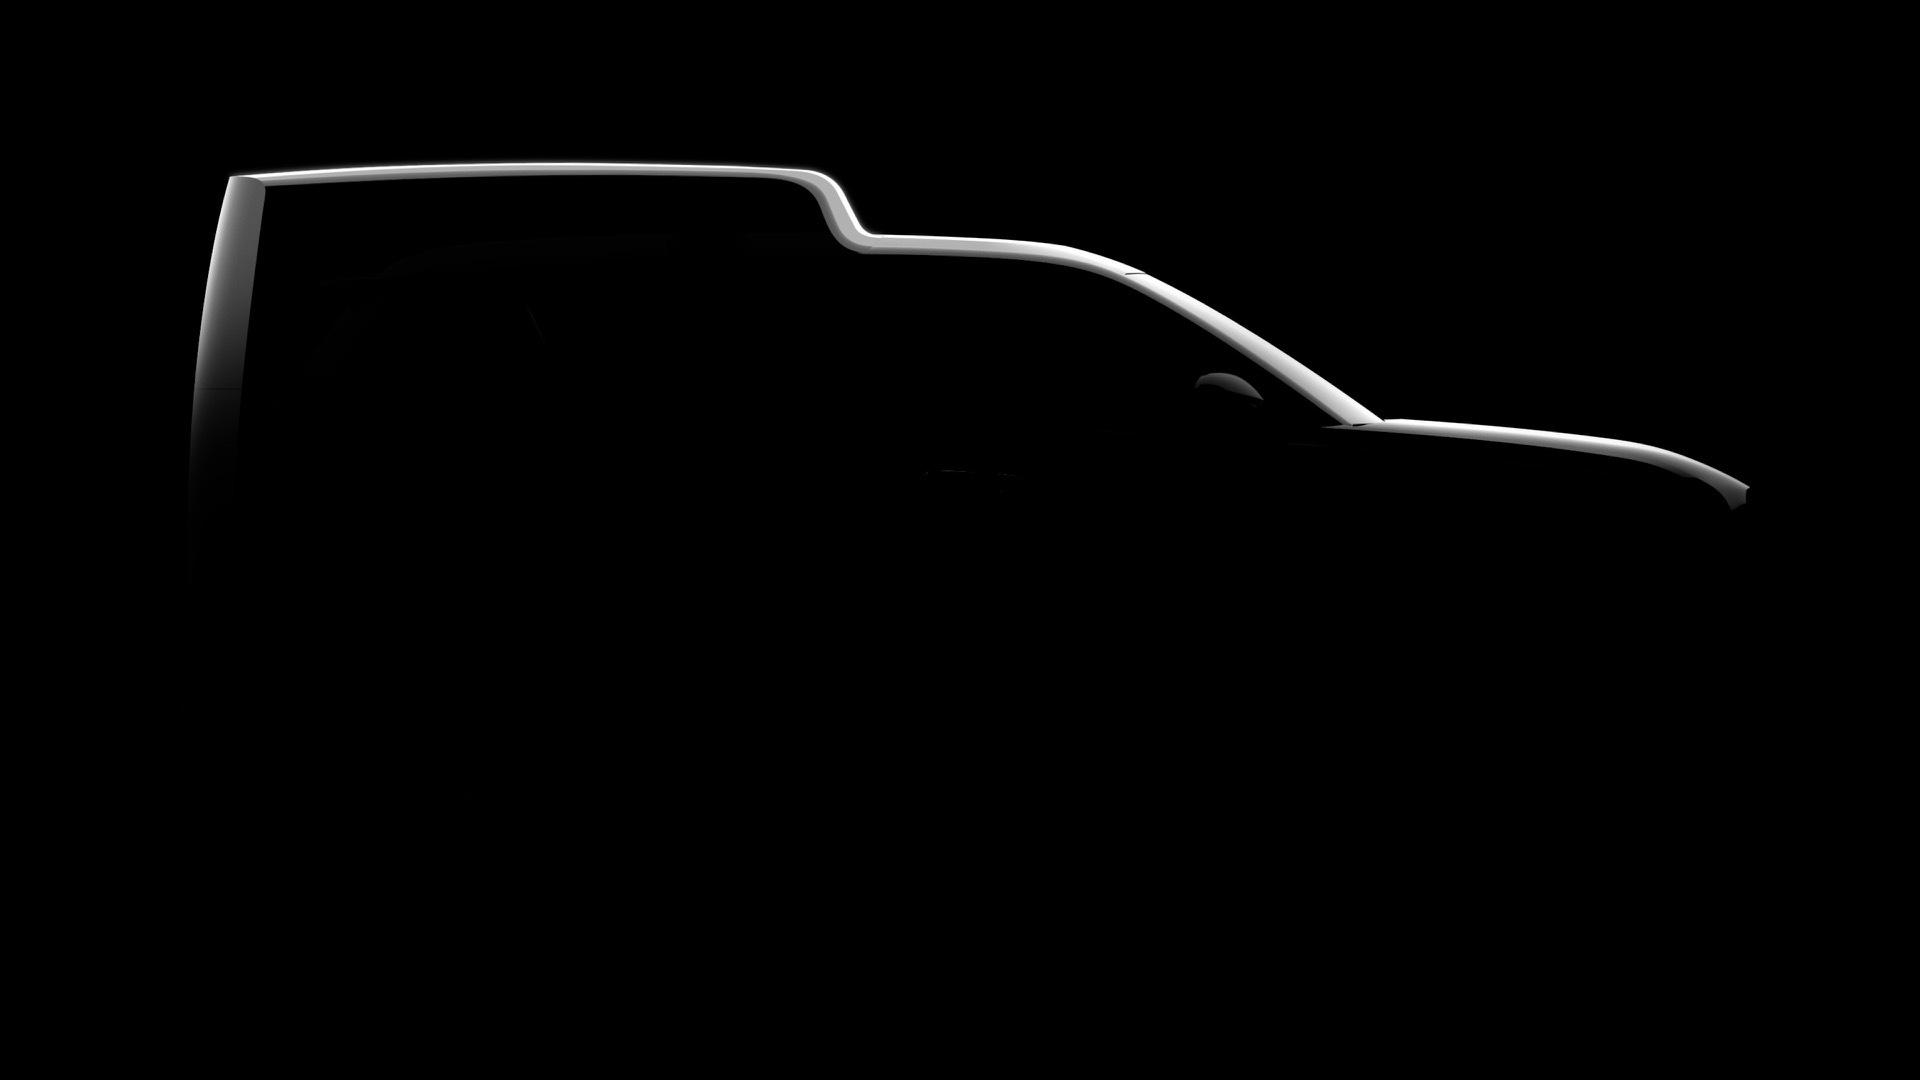 Future EV teased in Renault eWays ElectroPop presentation